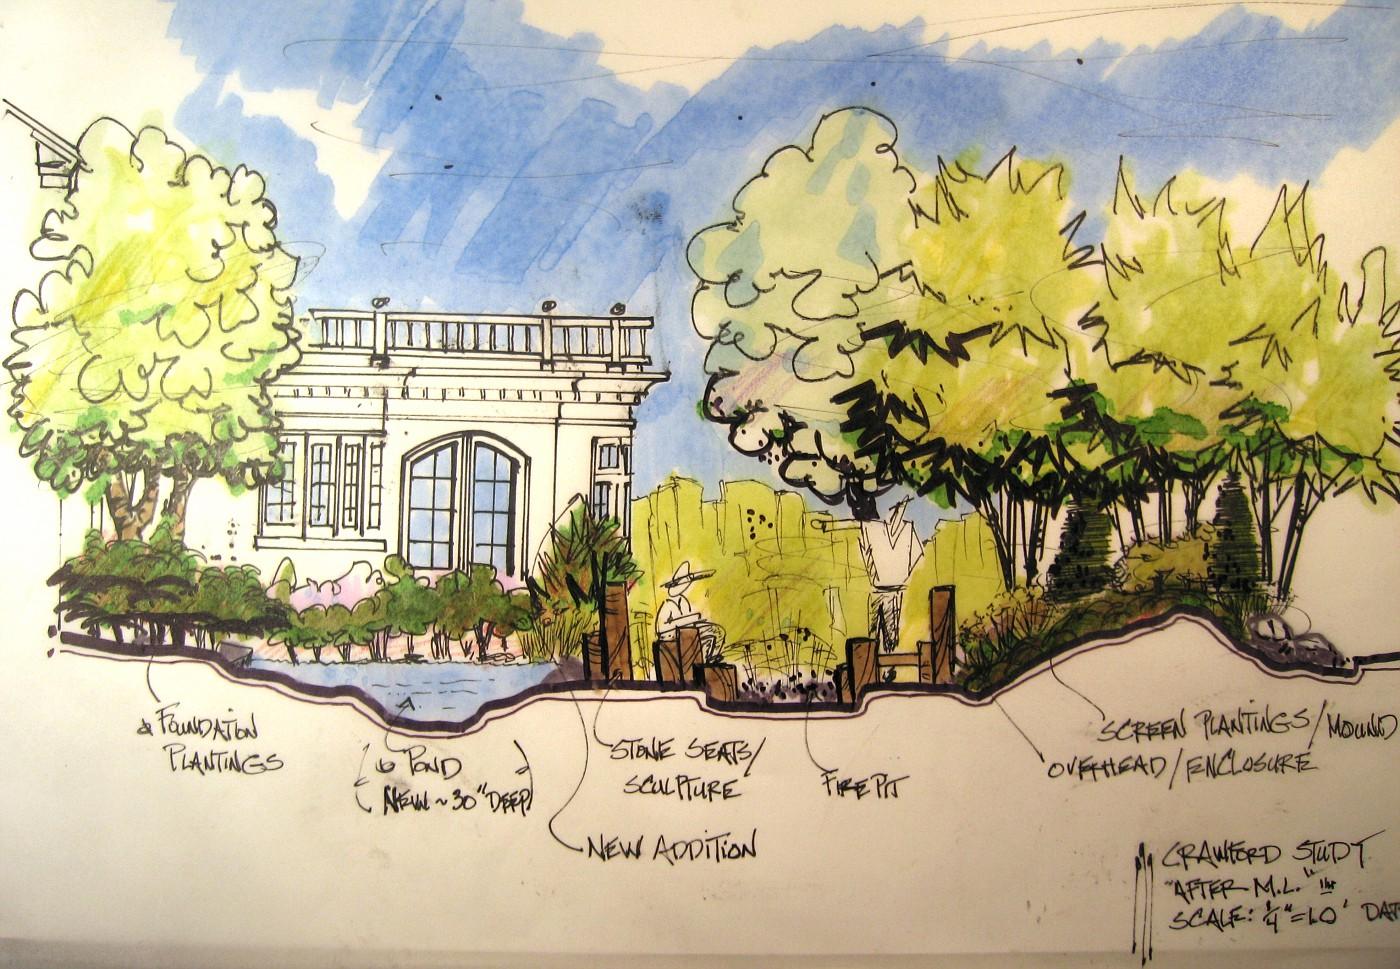 Whispering Crane Institute Evolution of Landscape Rendering Presentation